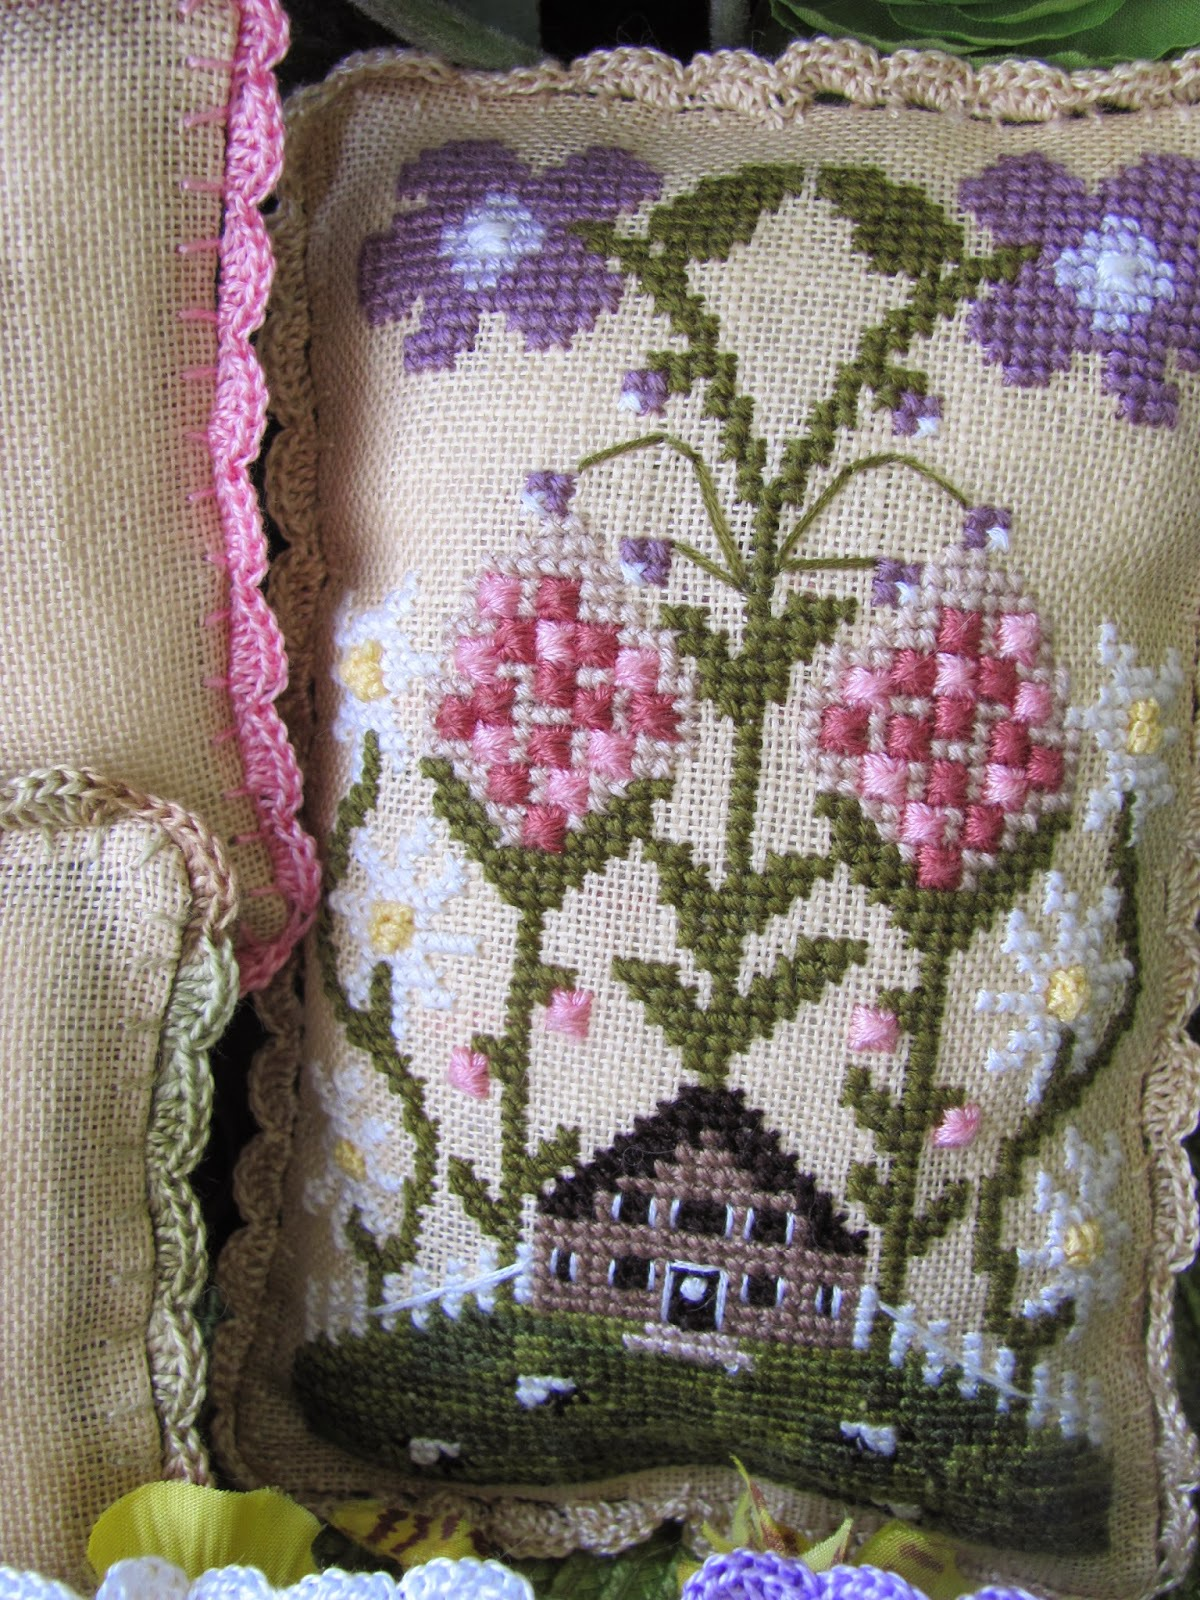 My Secret Garden: My Secret Garden Cross Stitch Chart By The Bay Needleart